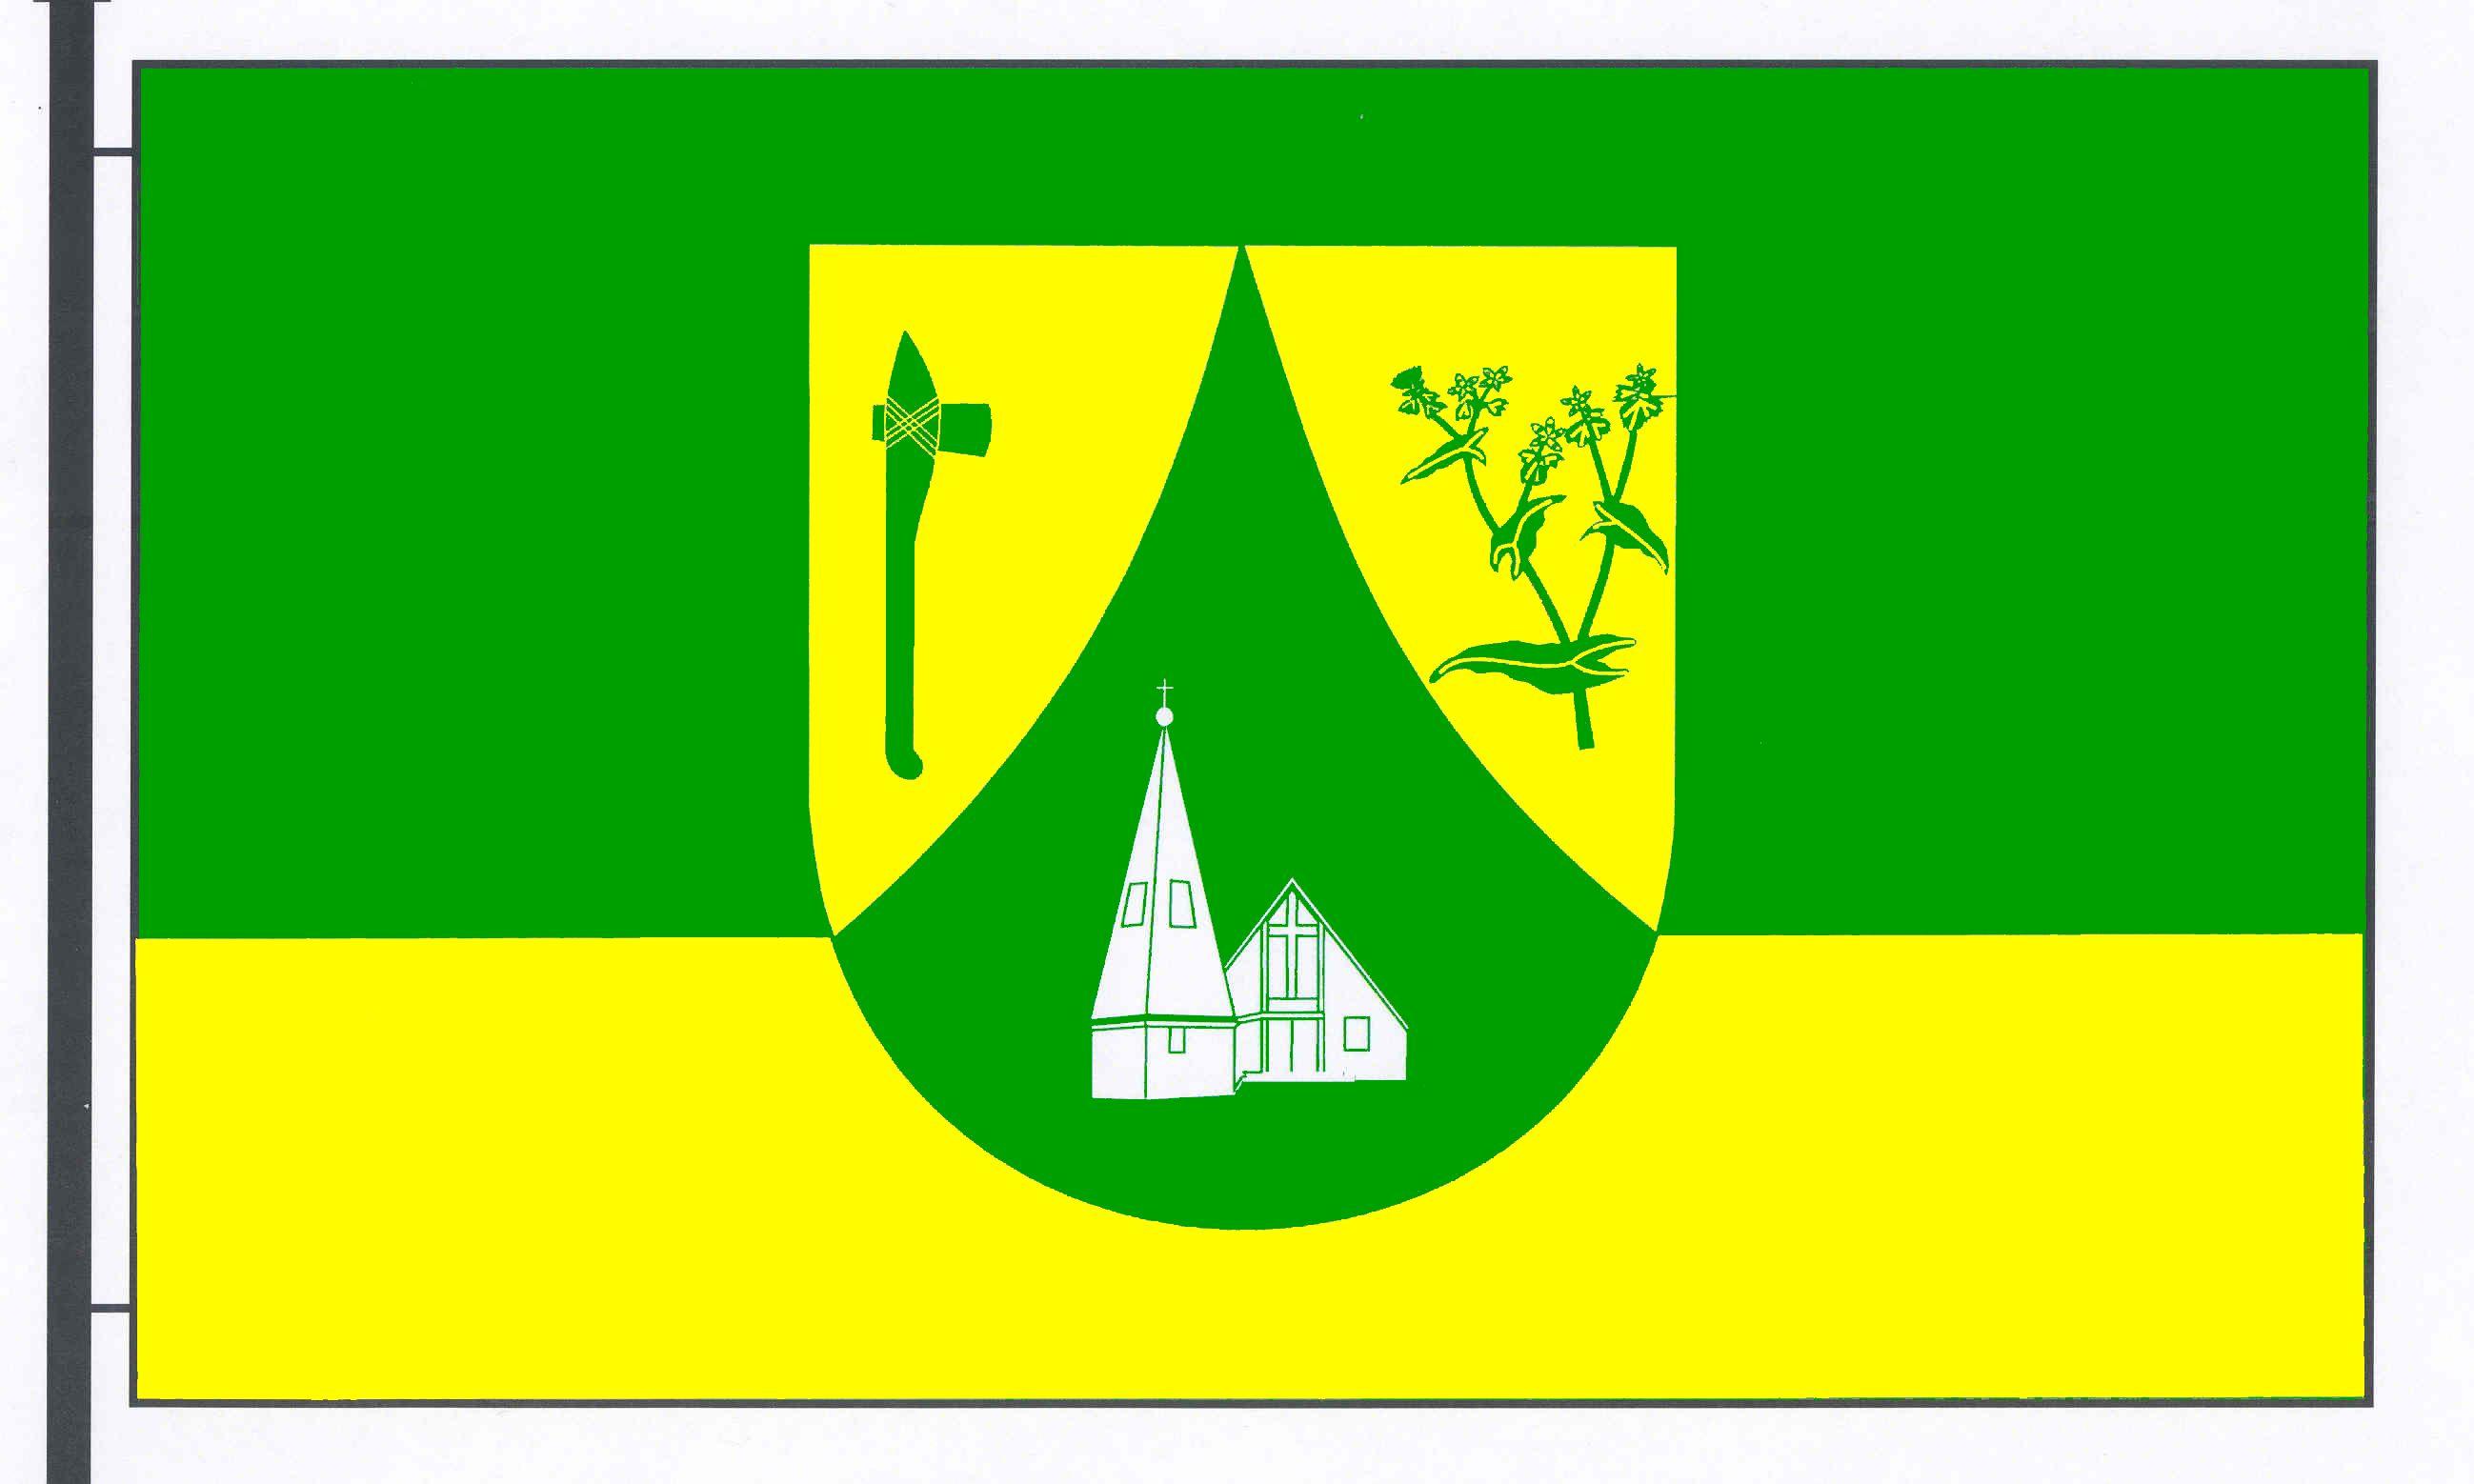 Flagge GemeindeGnutz, Kreis Rendsburg-Eckernförde